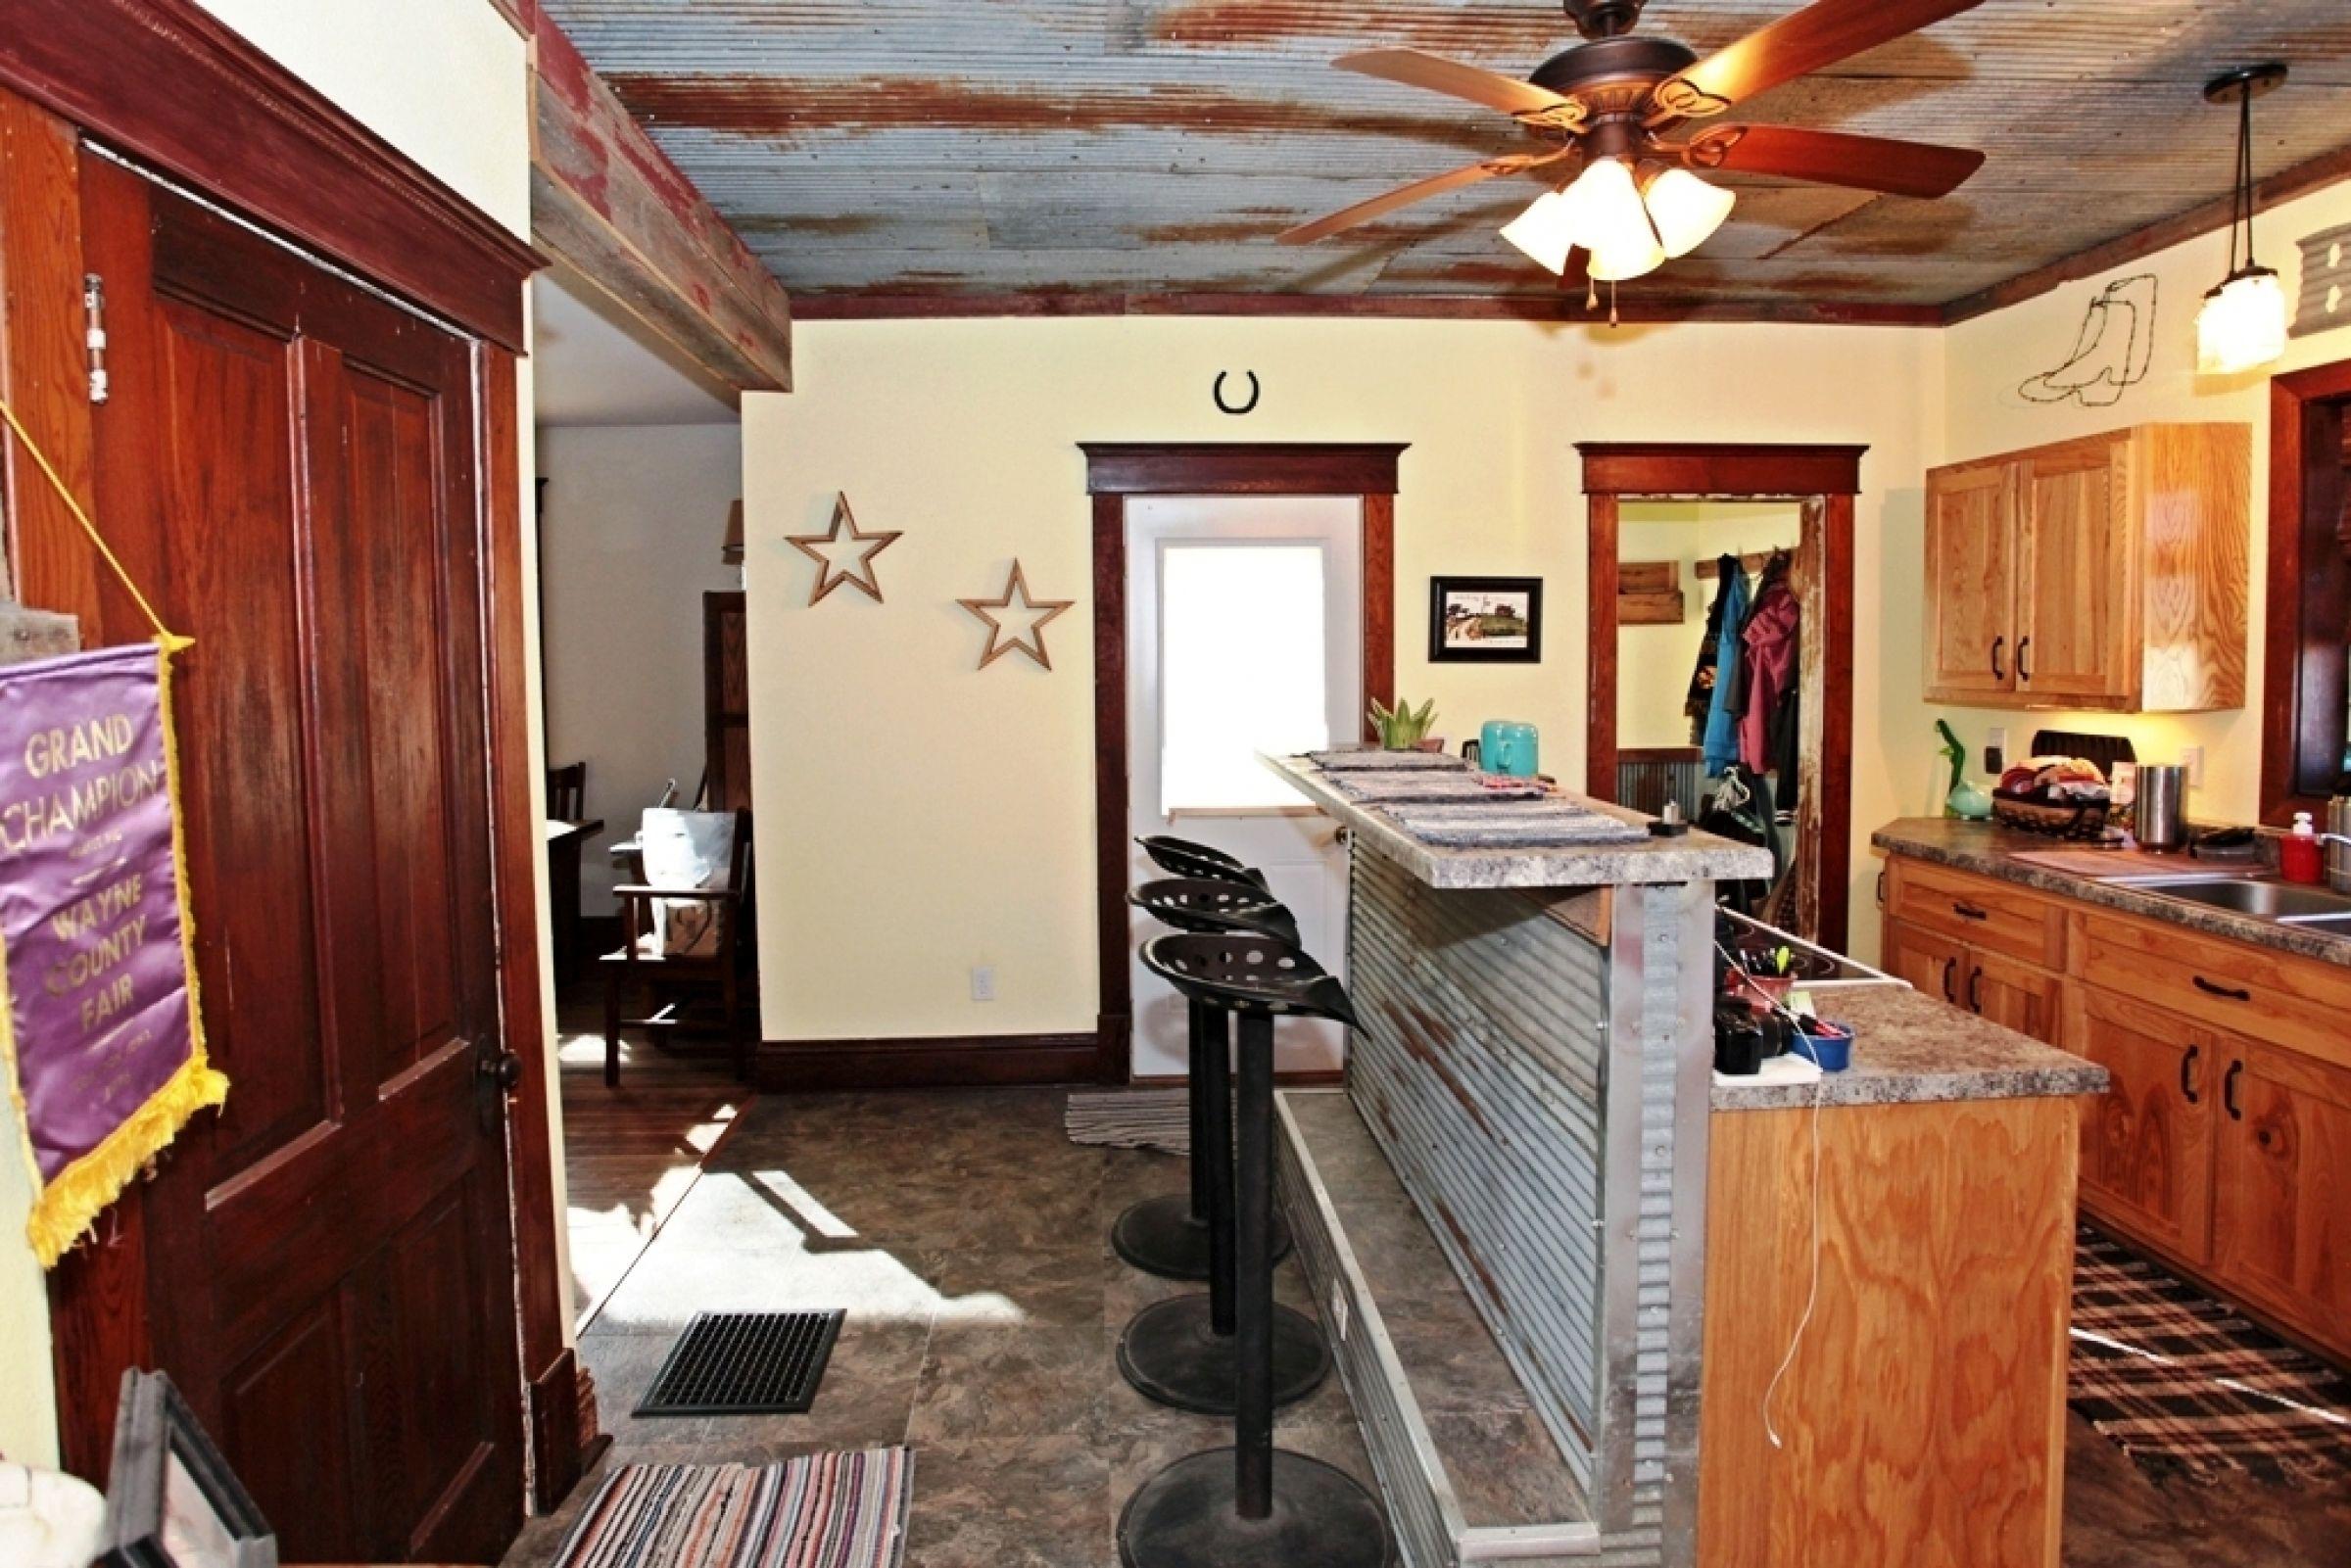 residential-wayne-county-iowa-1-acres-listing-number-15243-1-2020-11-05-200327.JPG